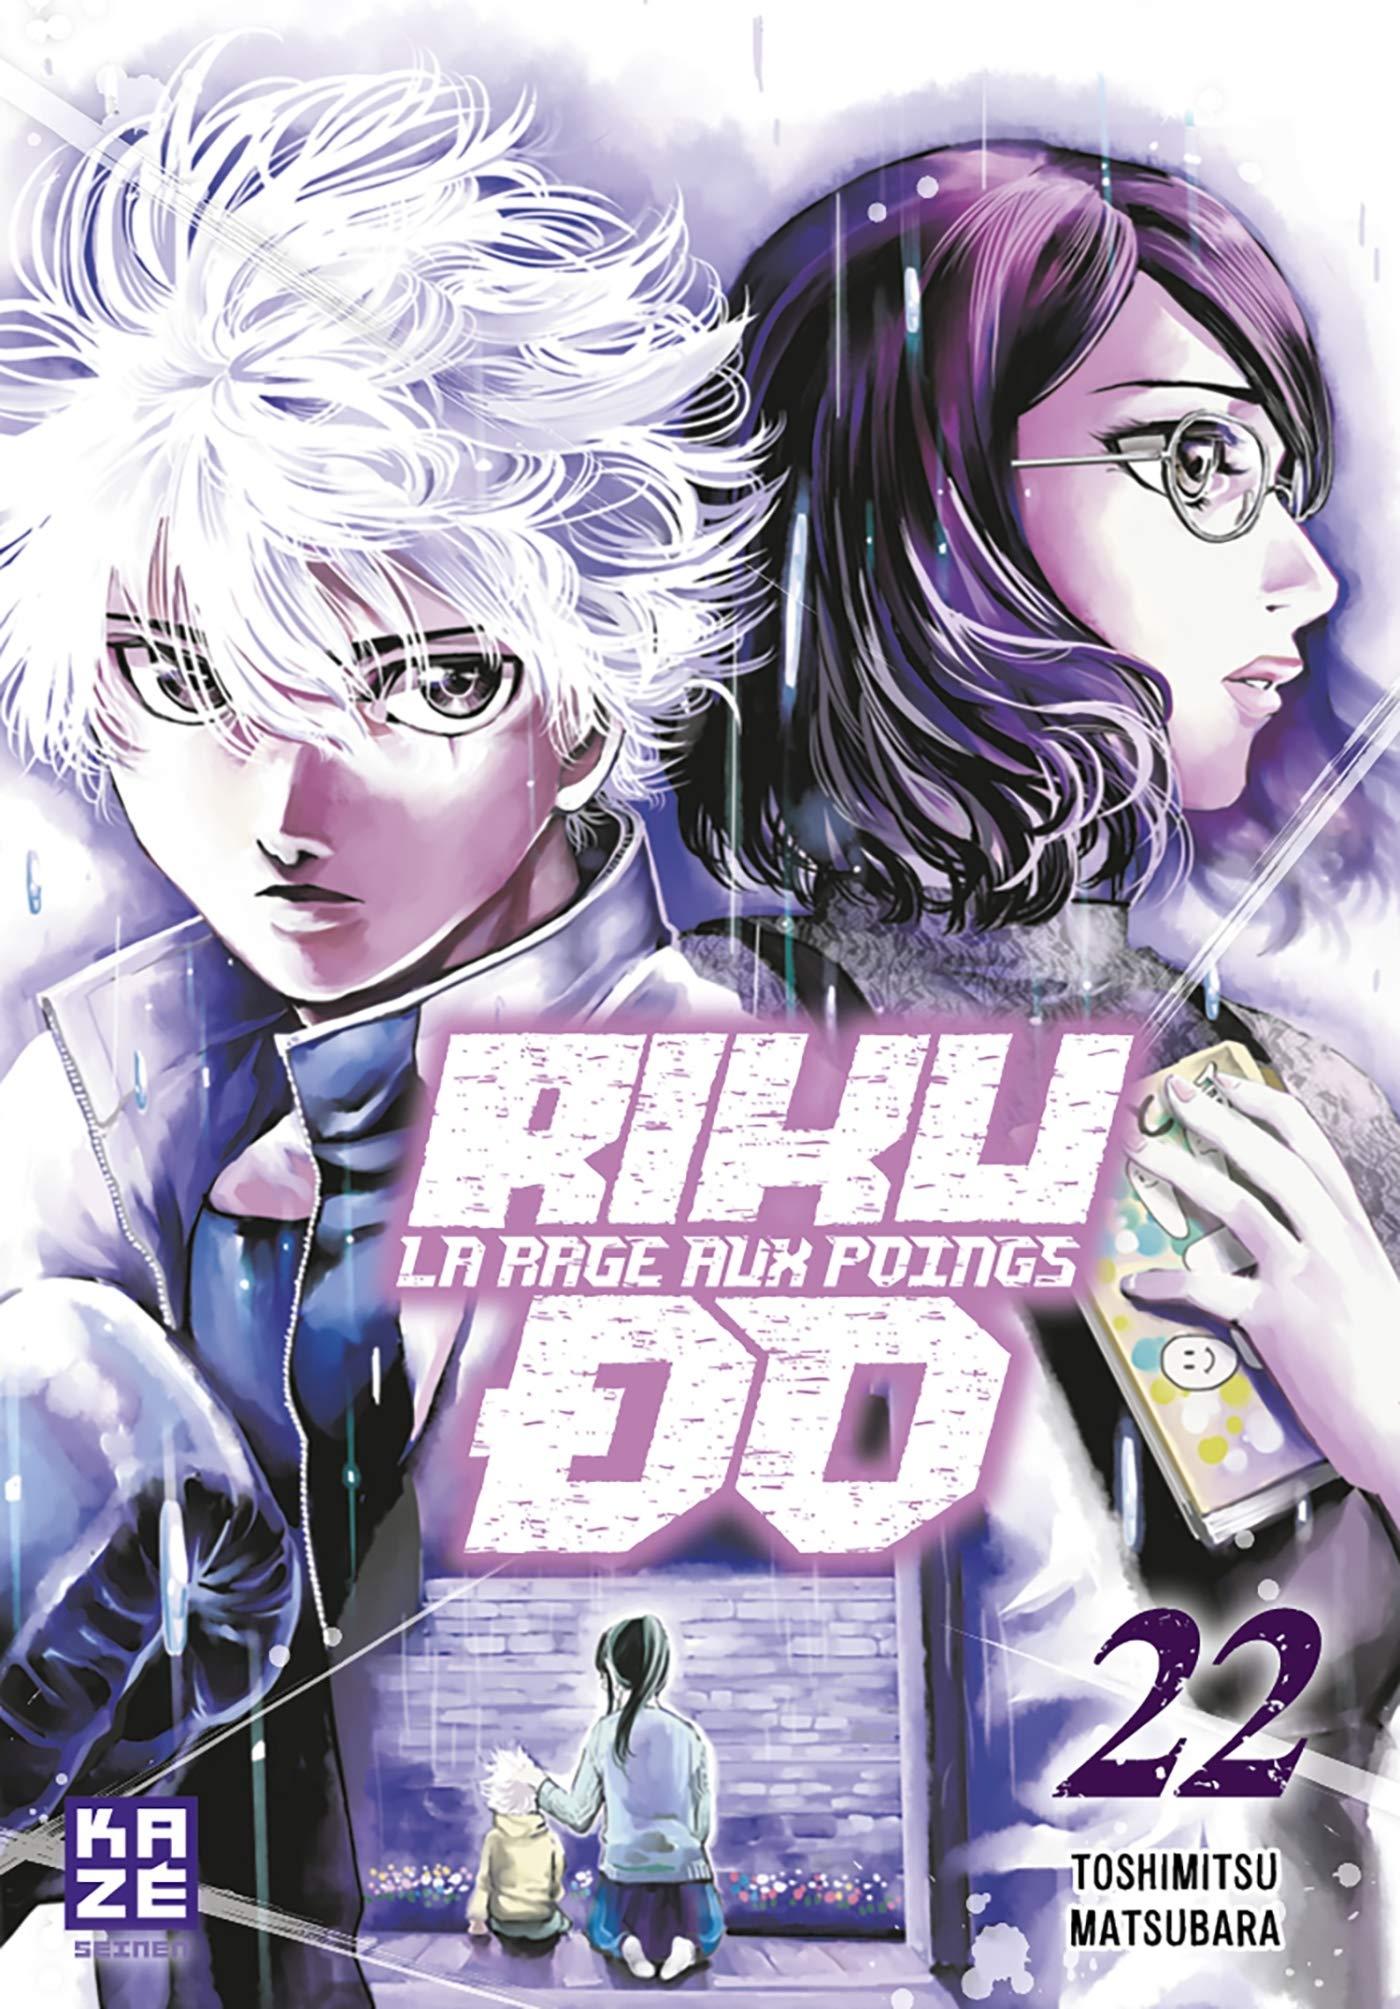 Riku-do 22